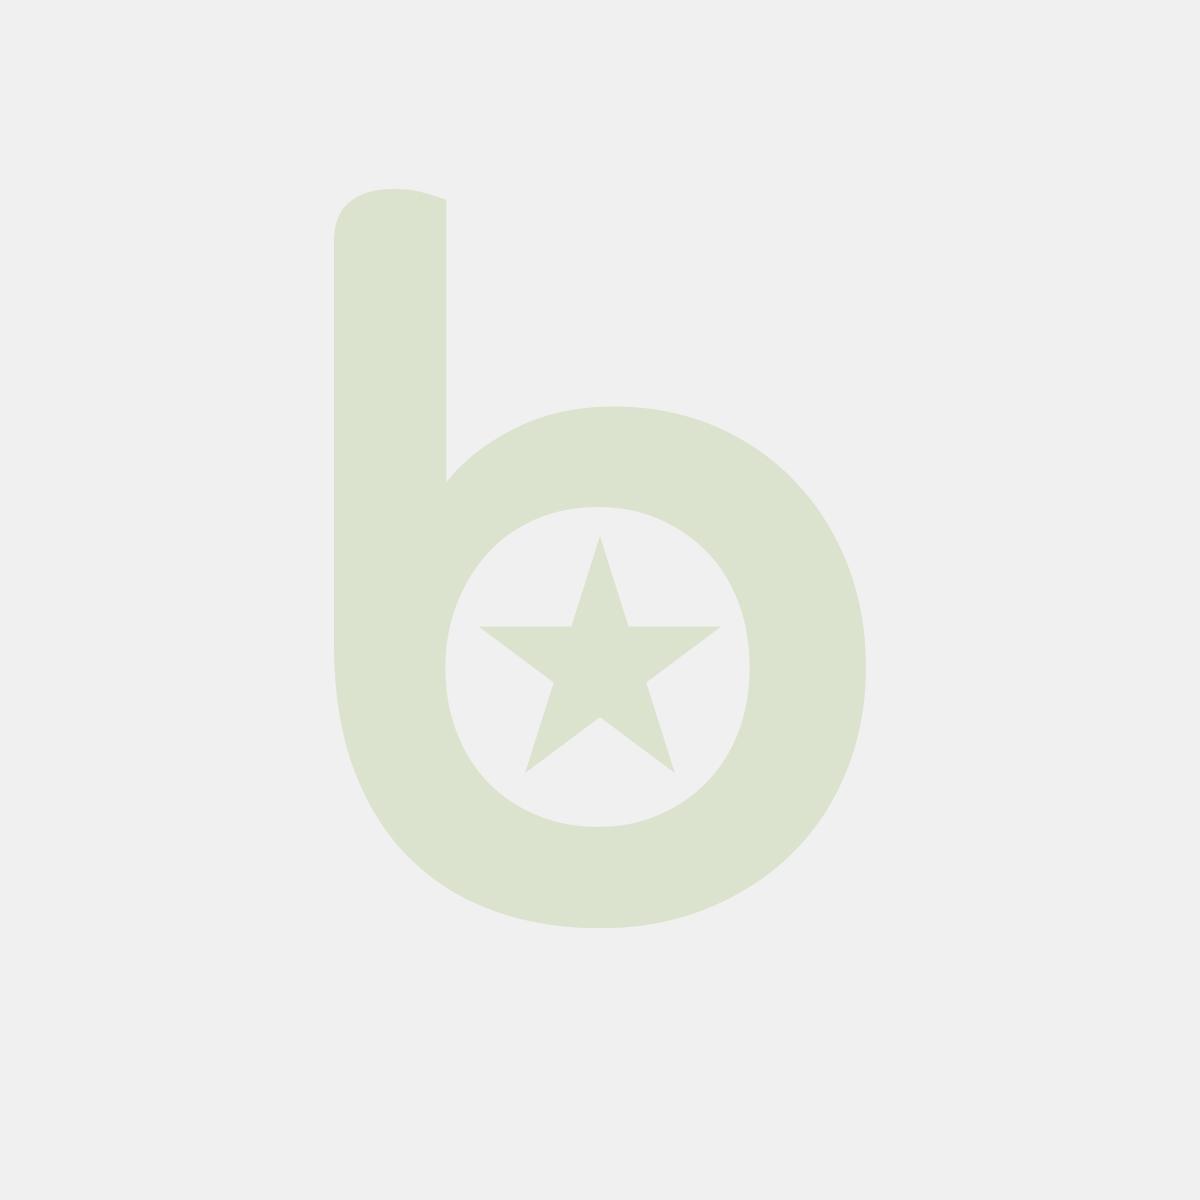 LUCART kosz na odpady 23L EcoNatural czarny